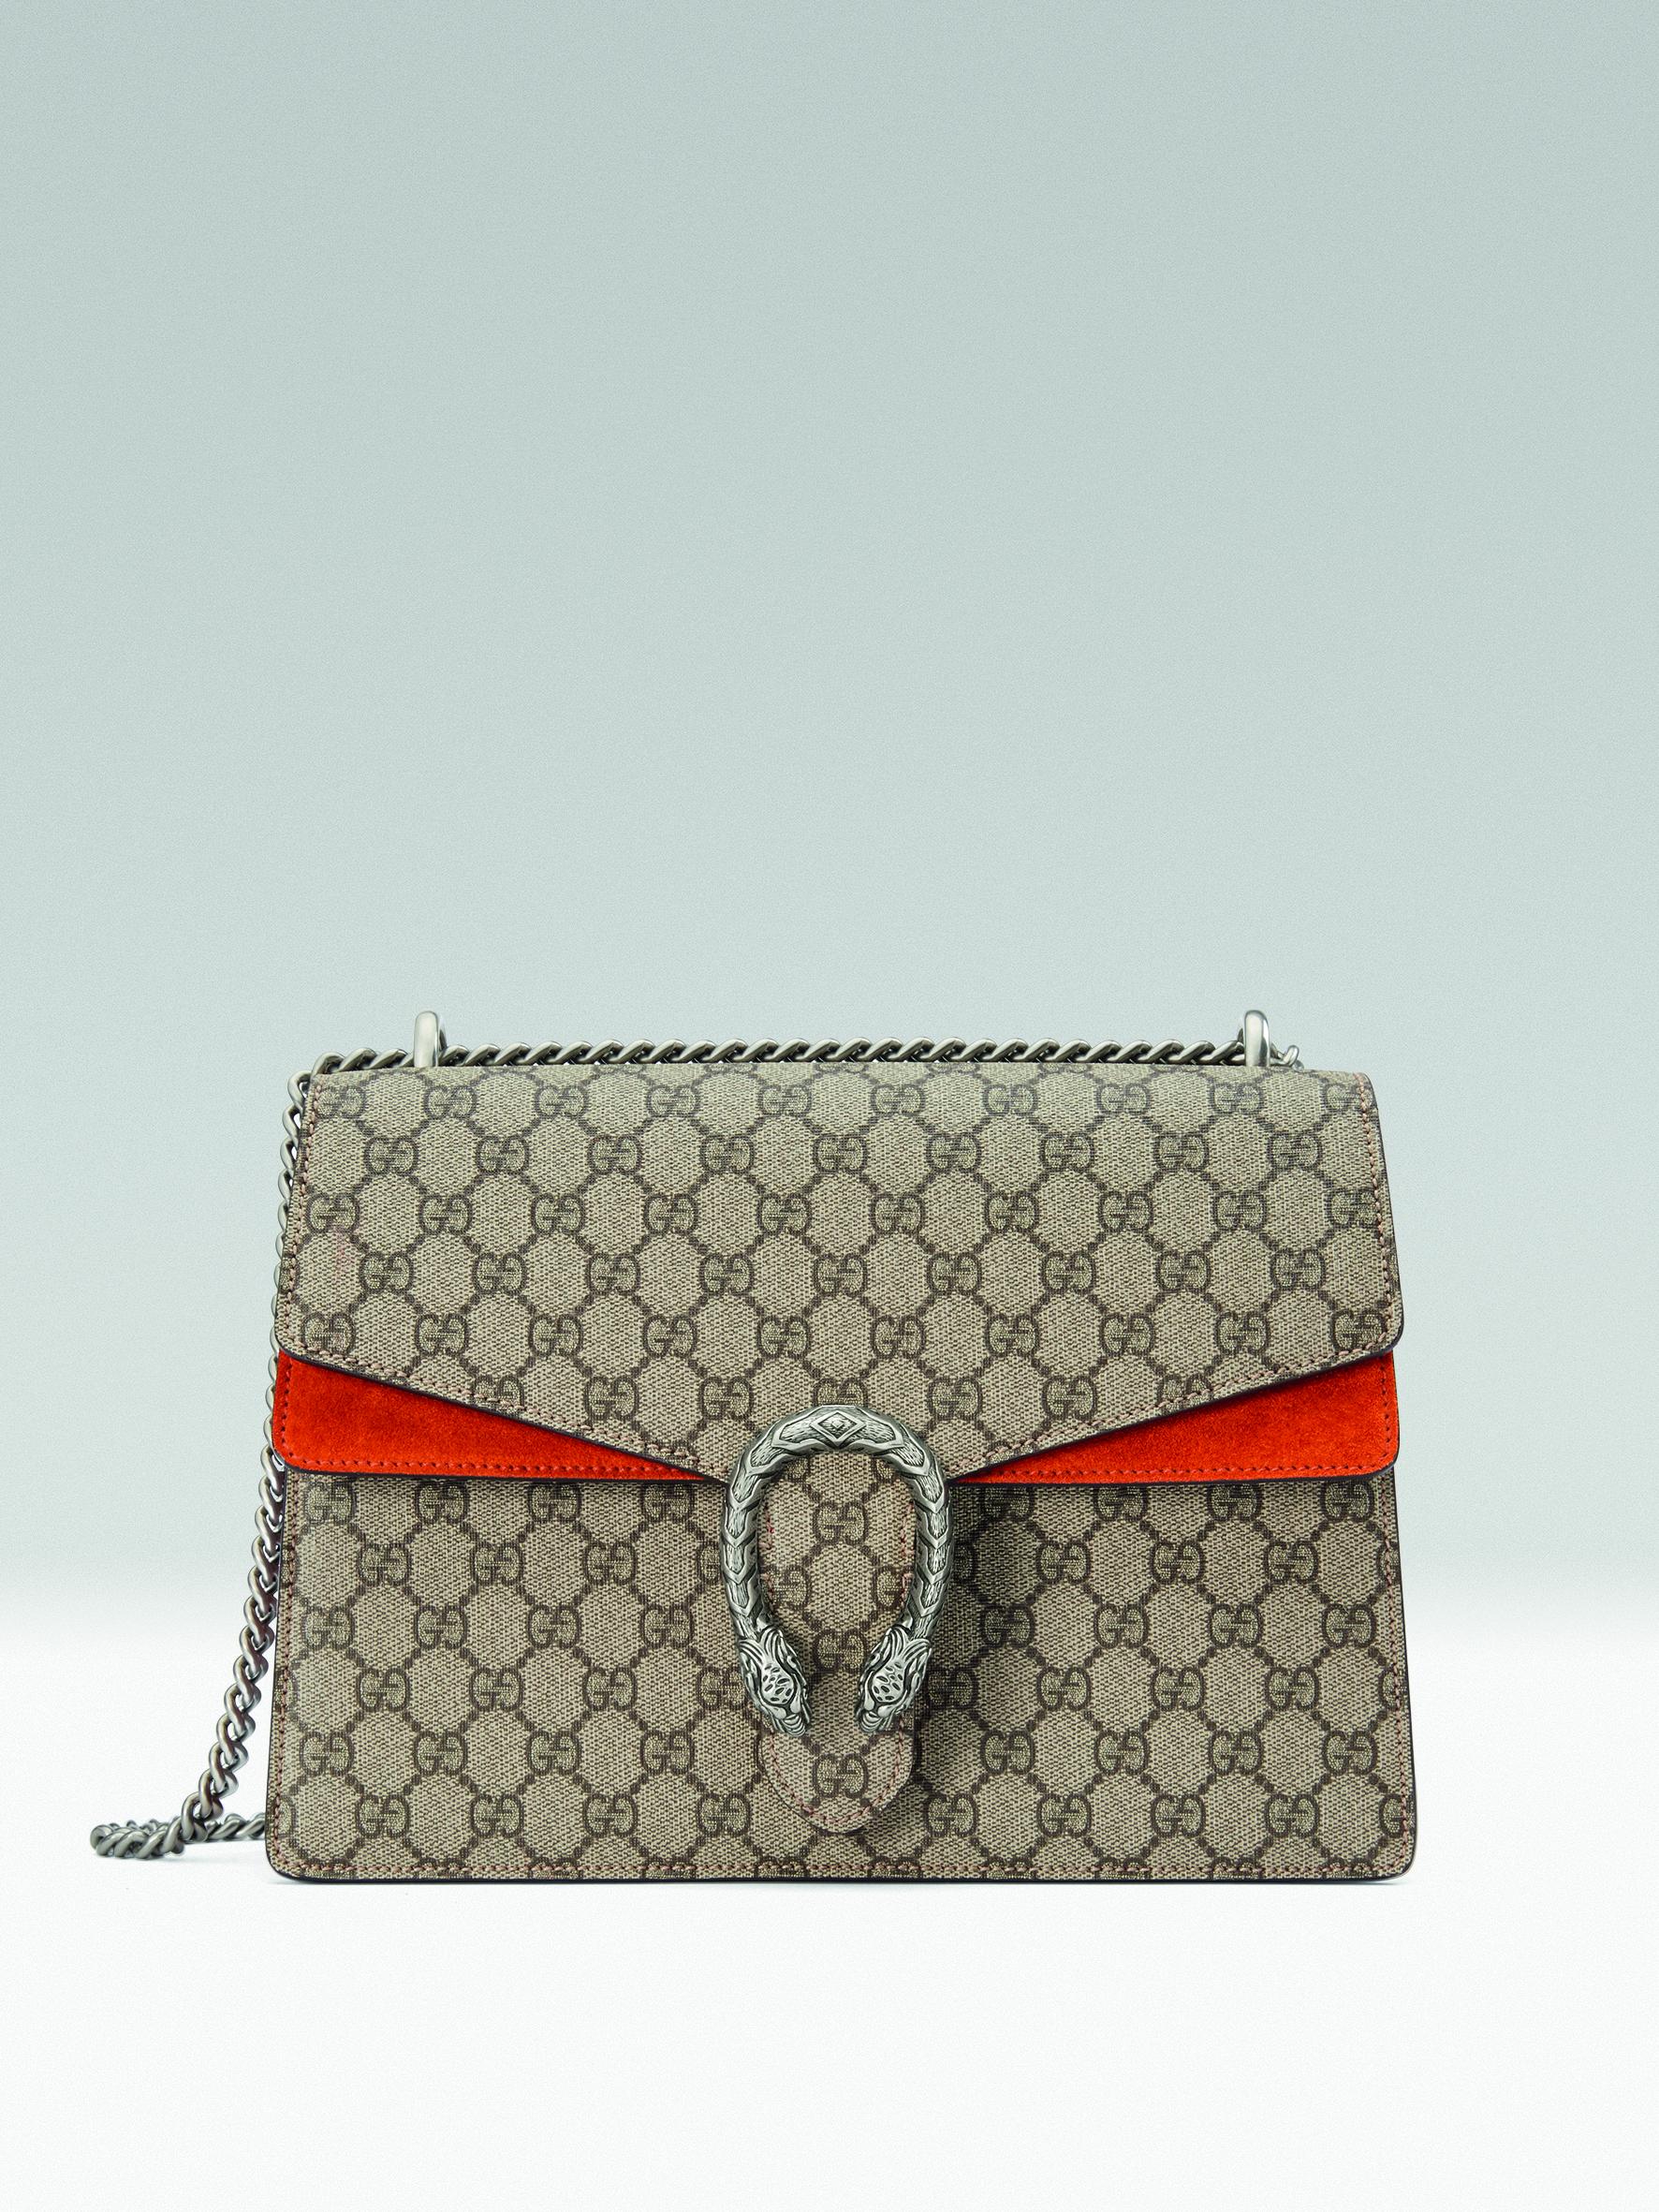 4d8af305caf9 ... Exclusivité Gucci for Galeries Lafayette « Dionysus » Sac à main – 1  690€ ...